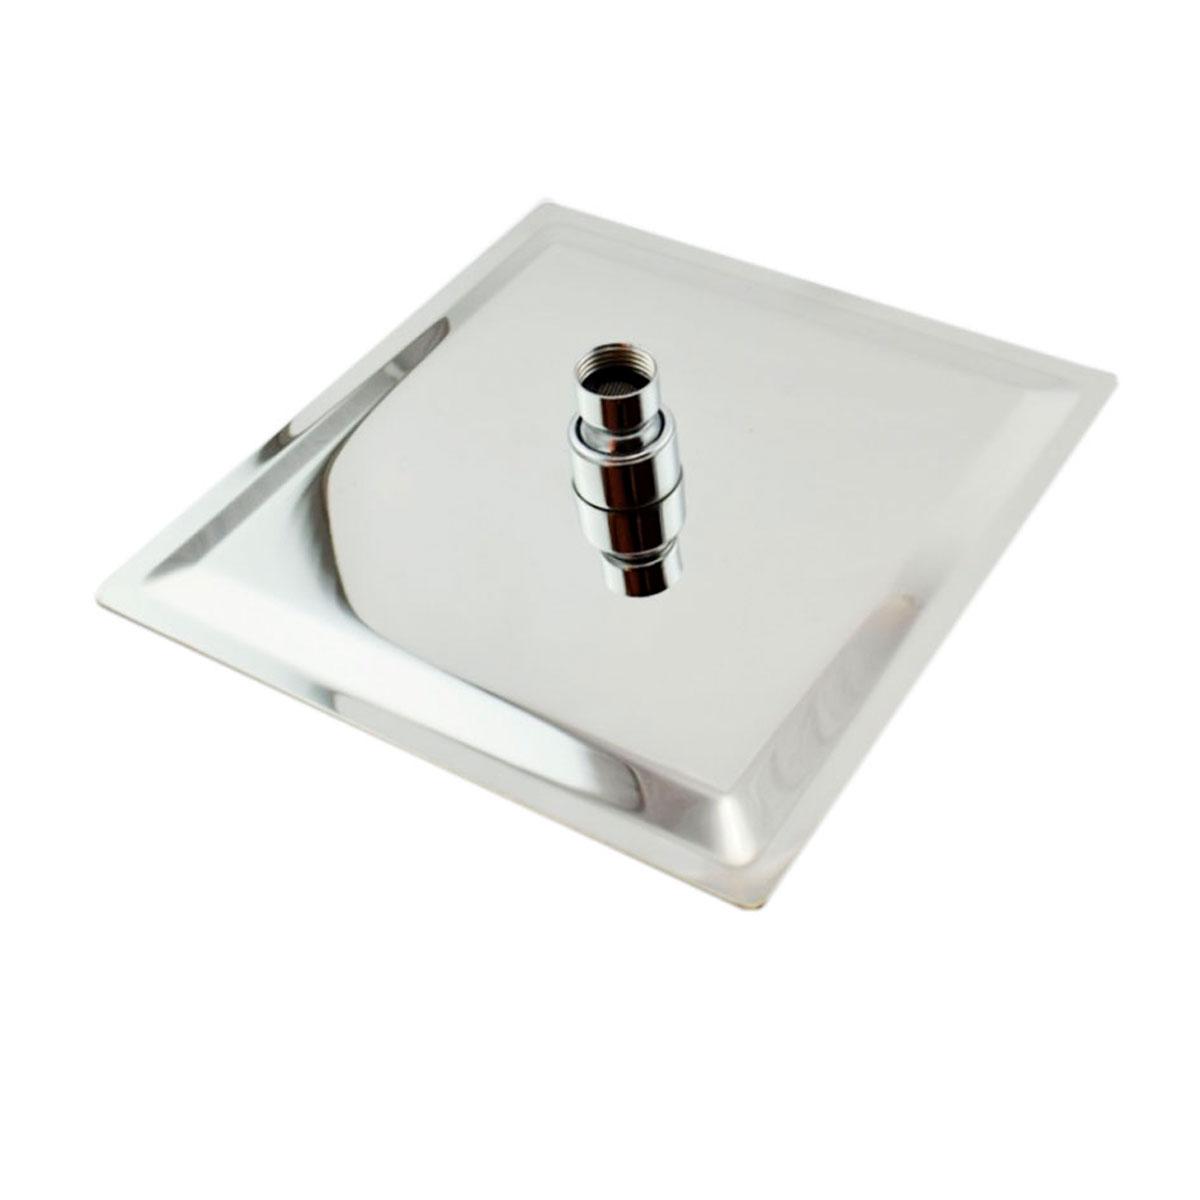 Kit Ducha Inox Chuveiro 25x25 Cm + Cano 35 Cm Quadrada